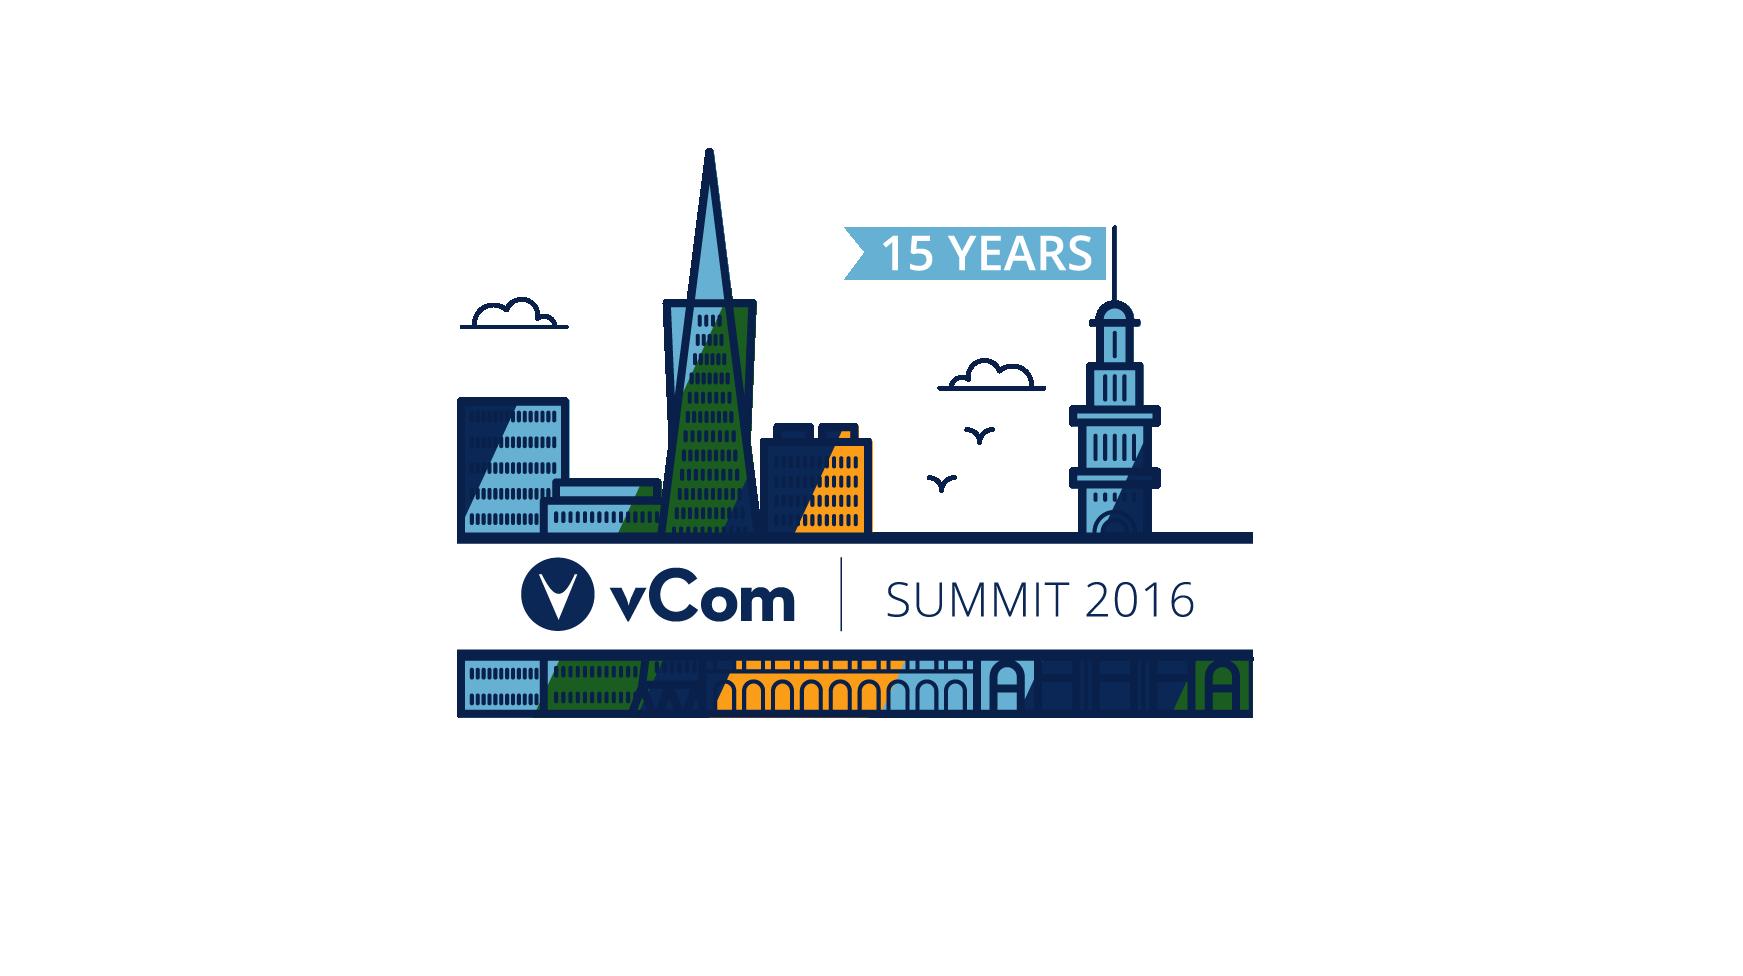 vCom_summitlogo_v4